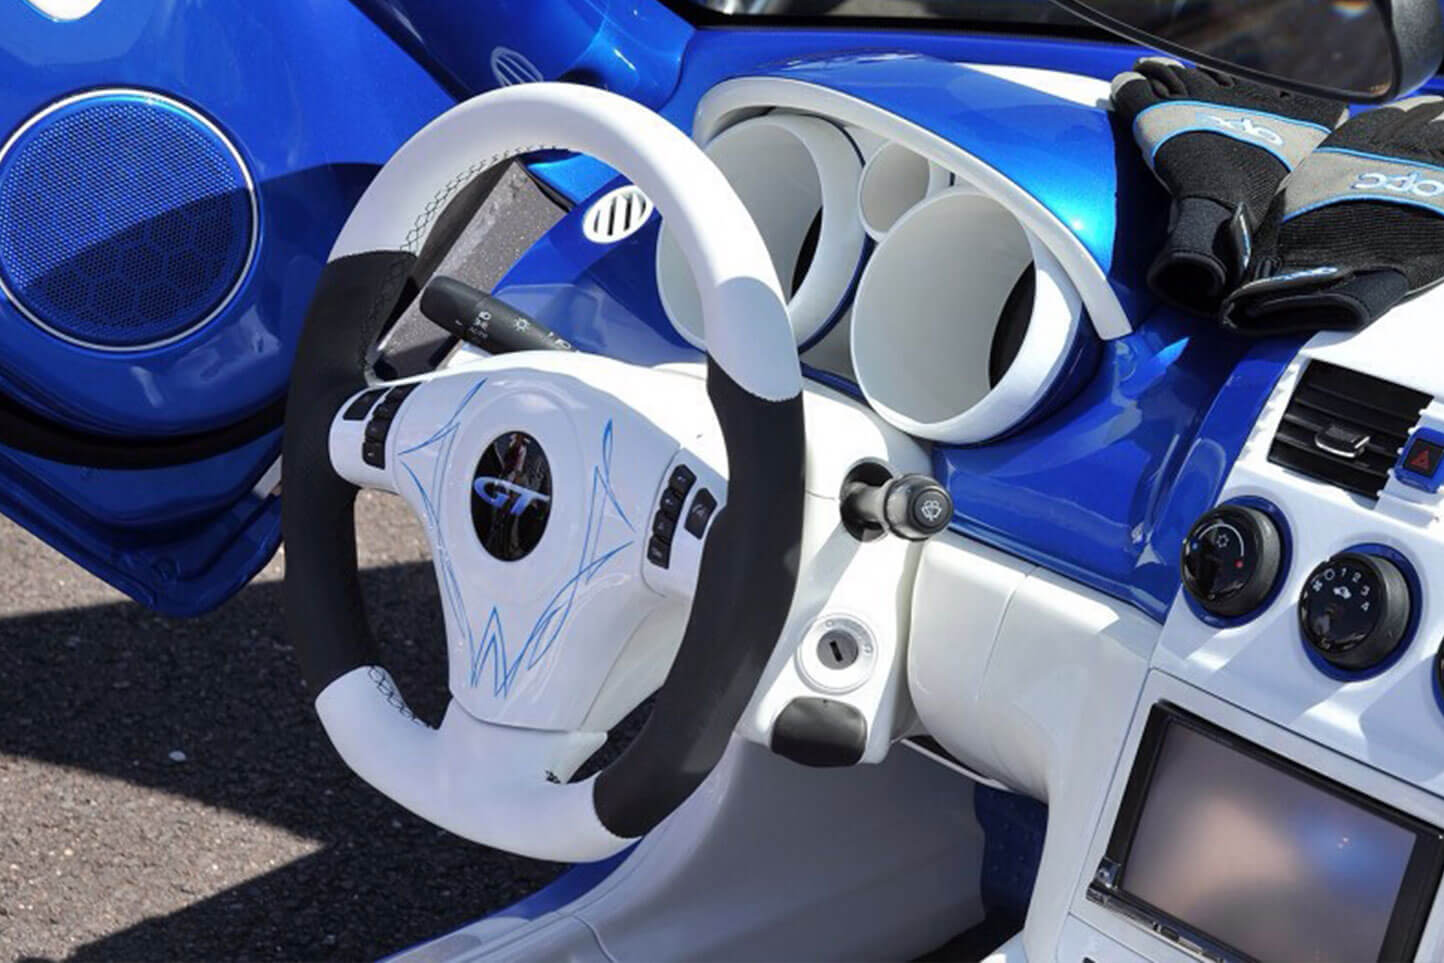 Kreis Tuning - Individuelle Sportlenkräder vom Profi